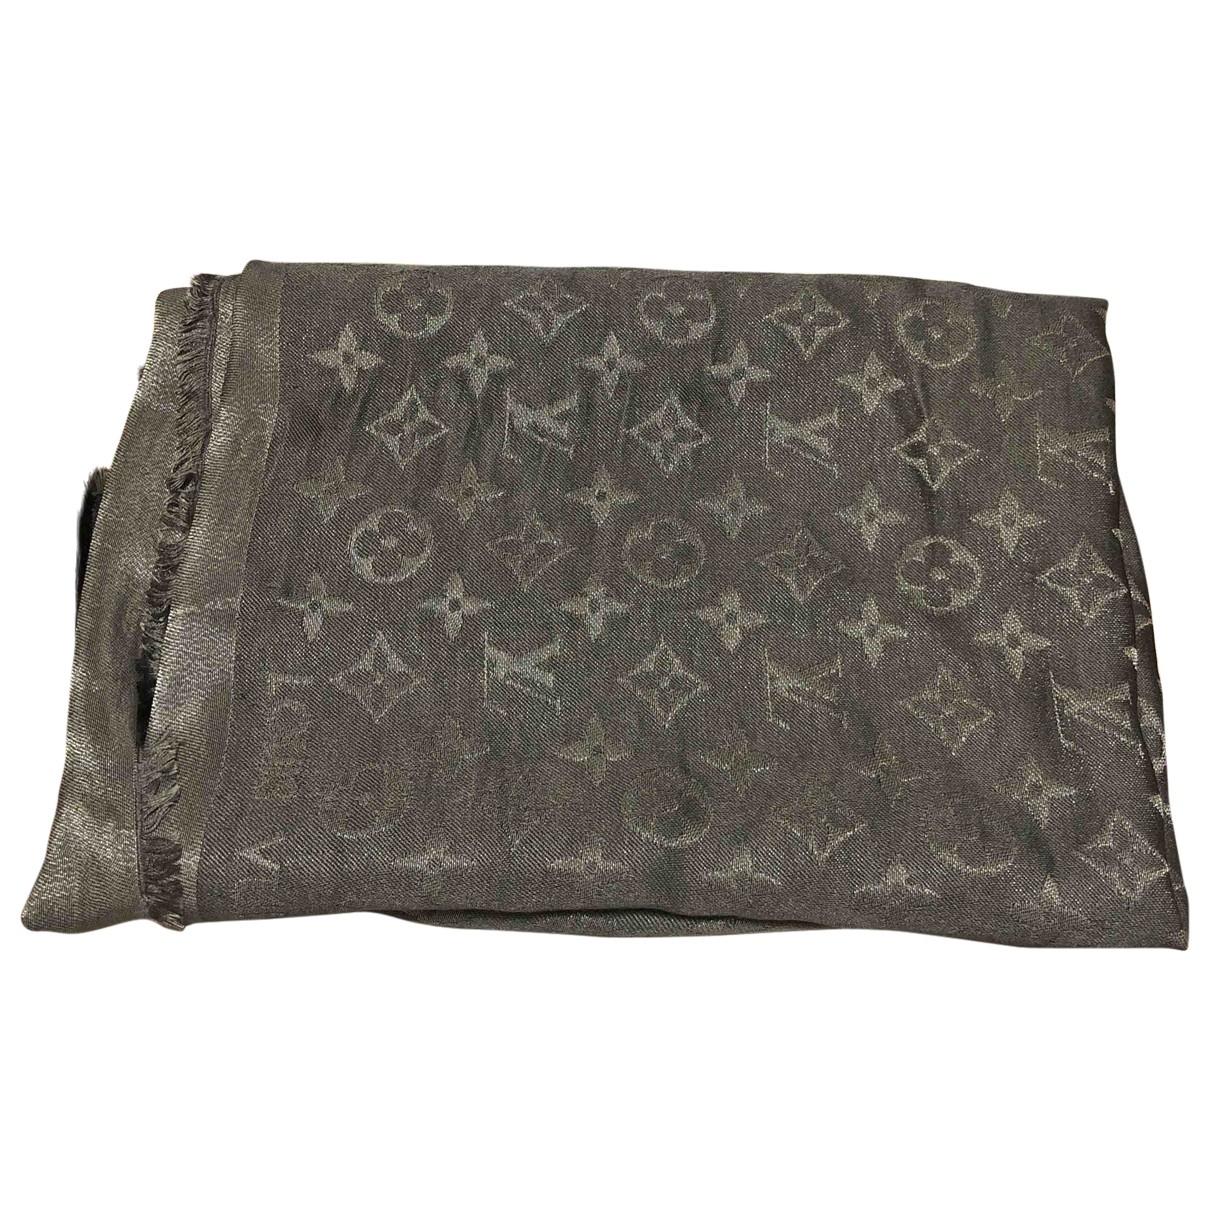 Louis Vuitton Chale Monogram shine Schal in  Grau Seide